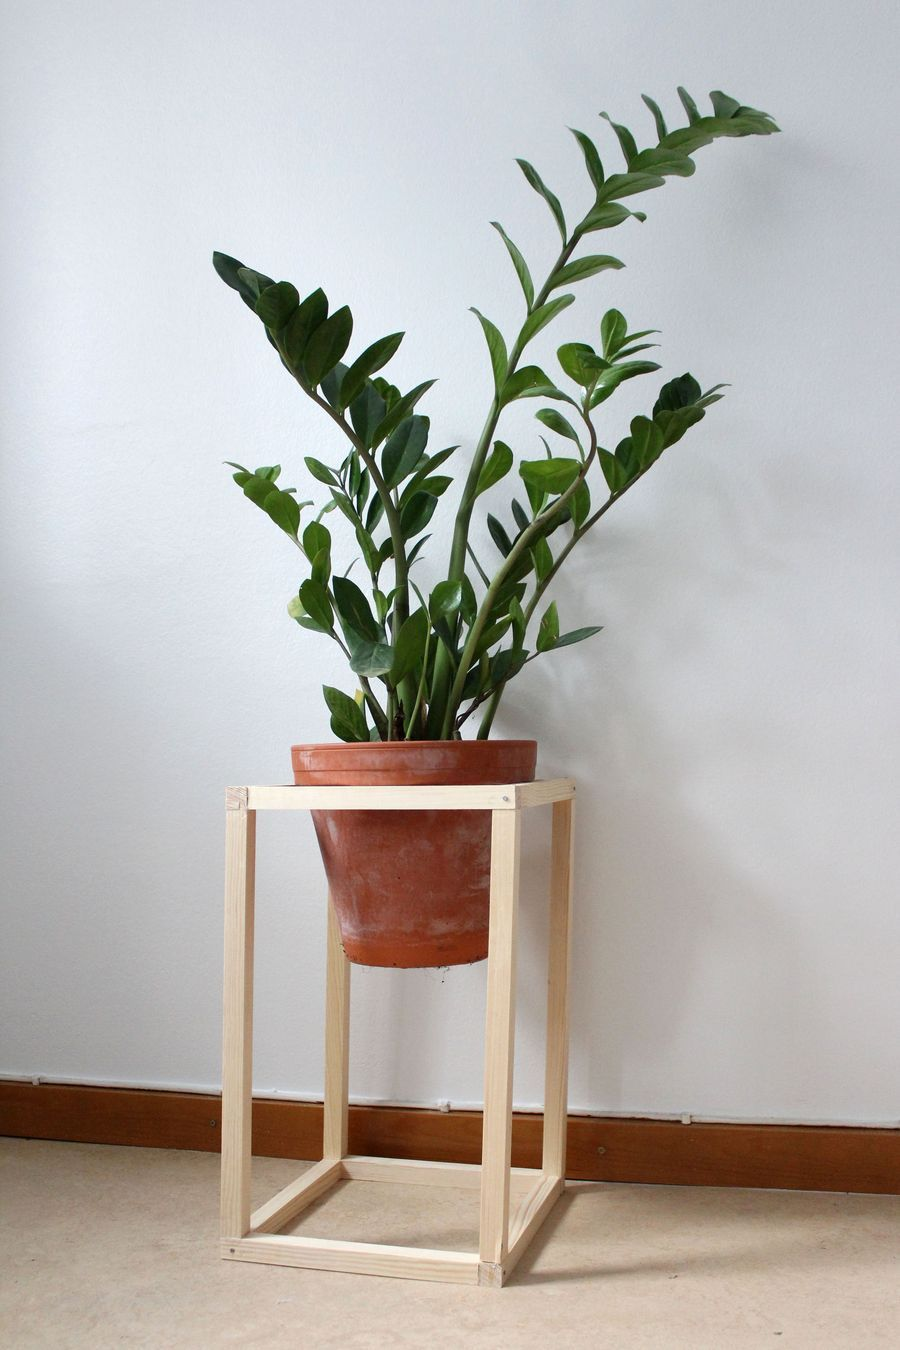 Diy Indoor Plant Stand Diyplantstandideas Plant Stand 640 x 480